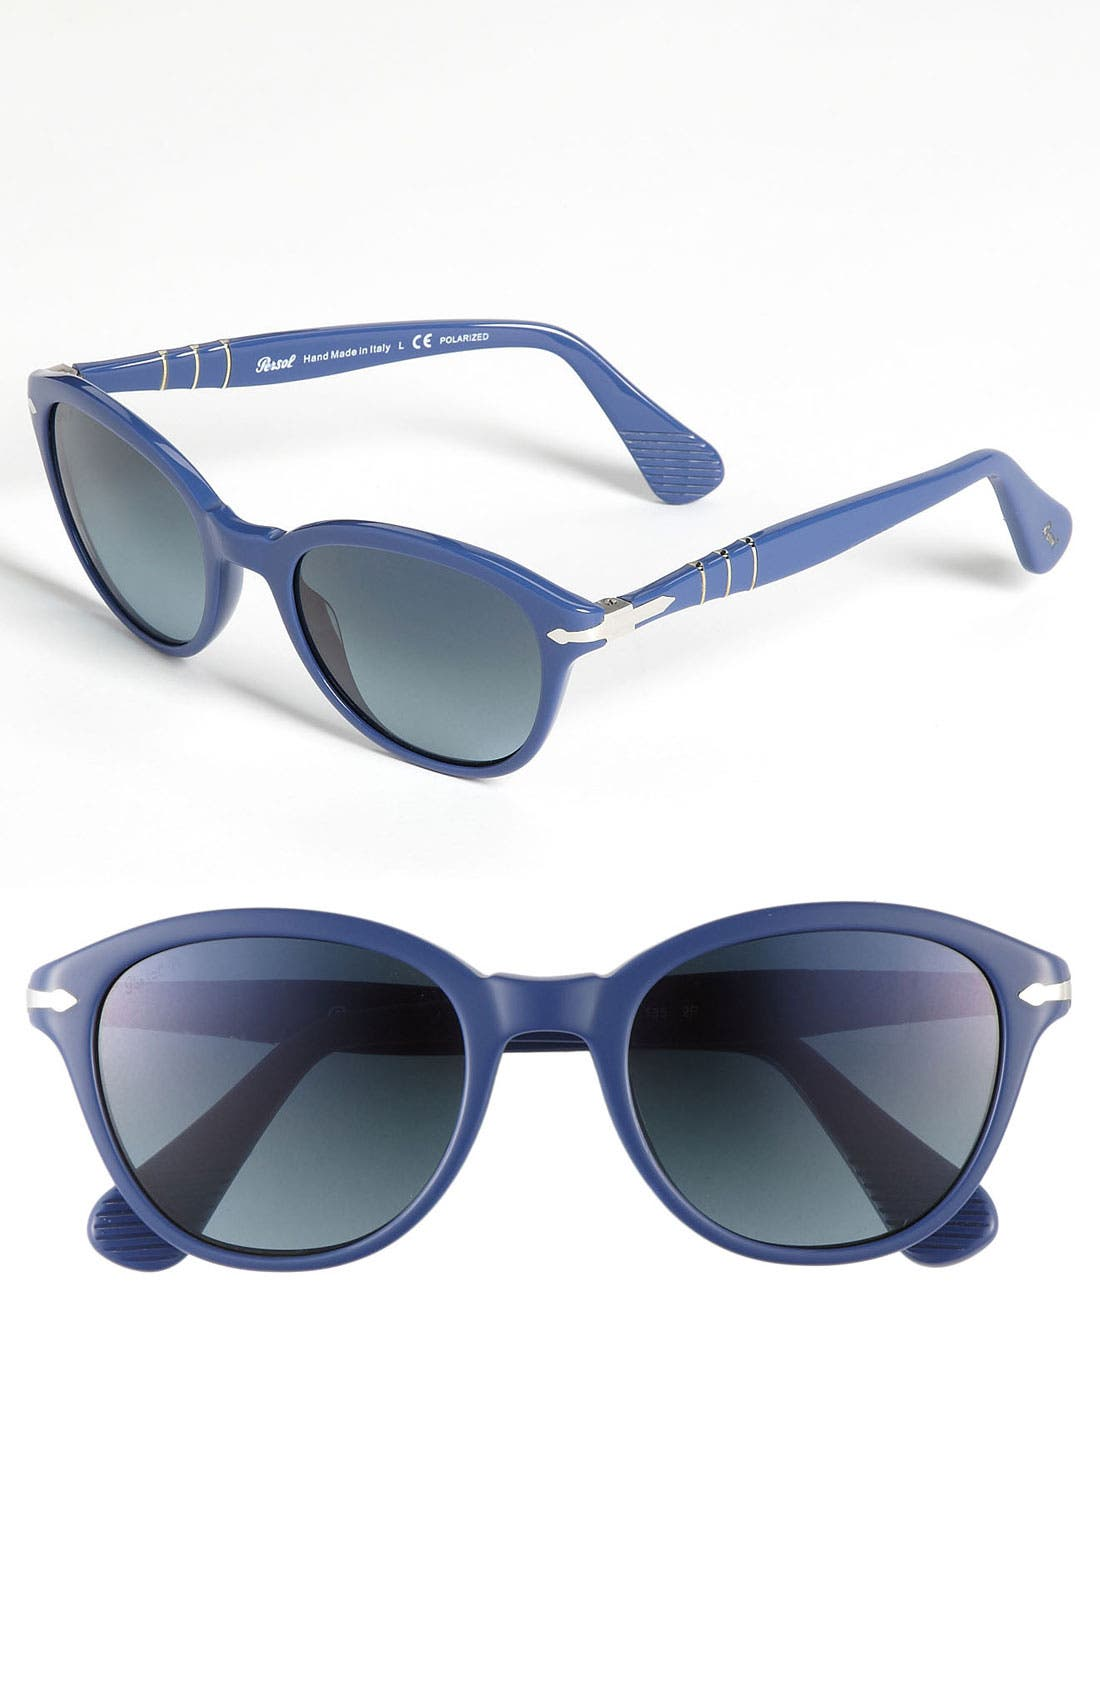 Alternate Image 1 Selected - Persol 50mm Polarized Round Retro Sunglasses